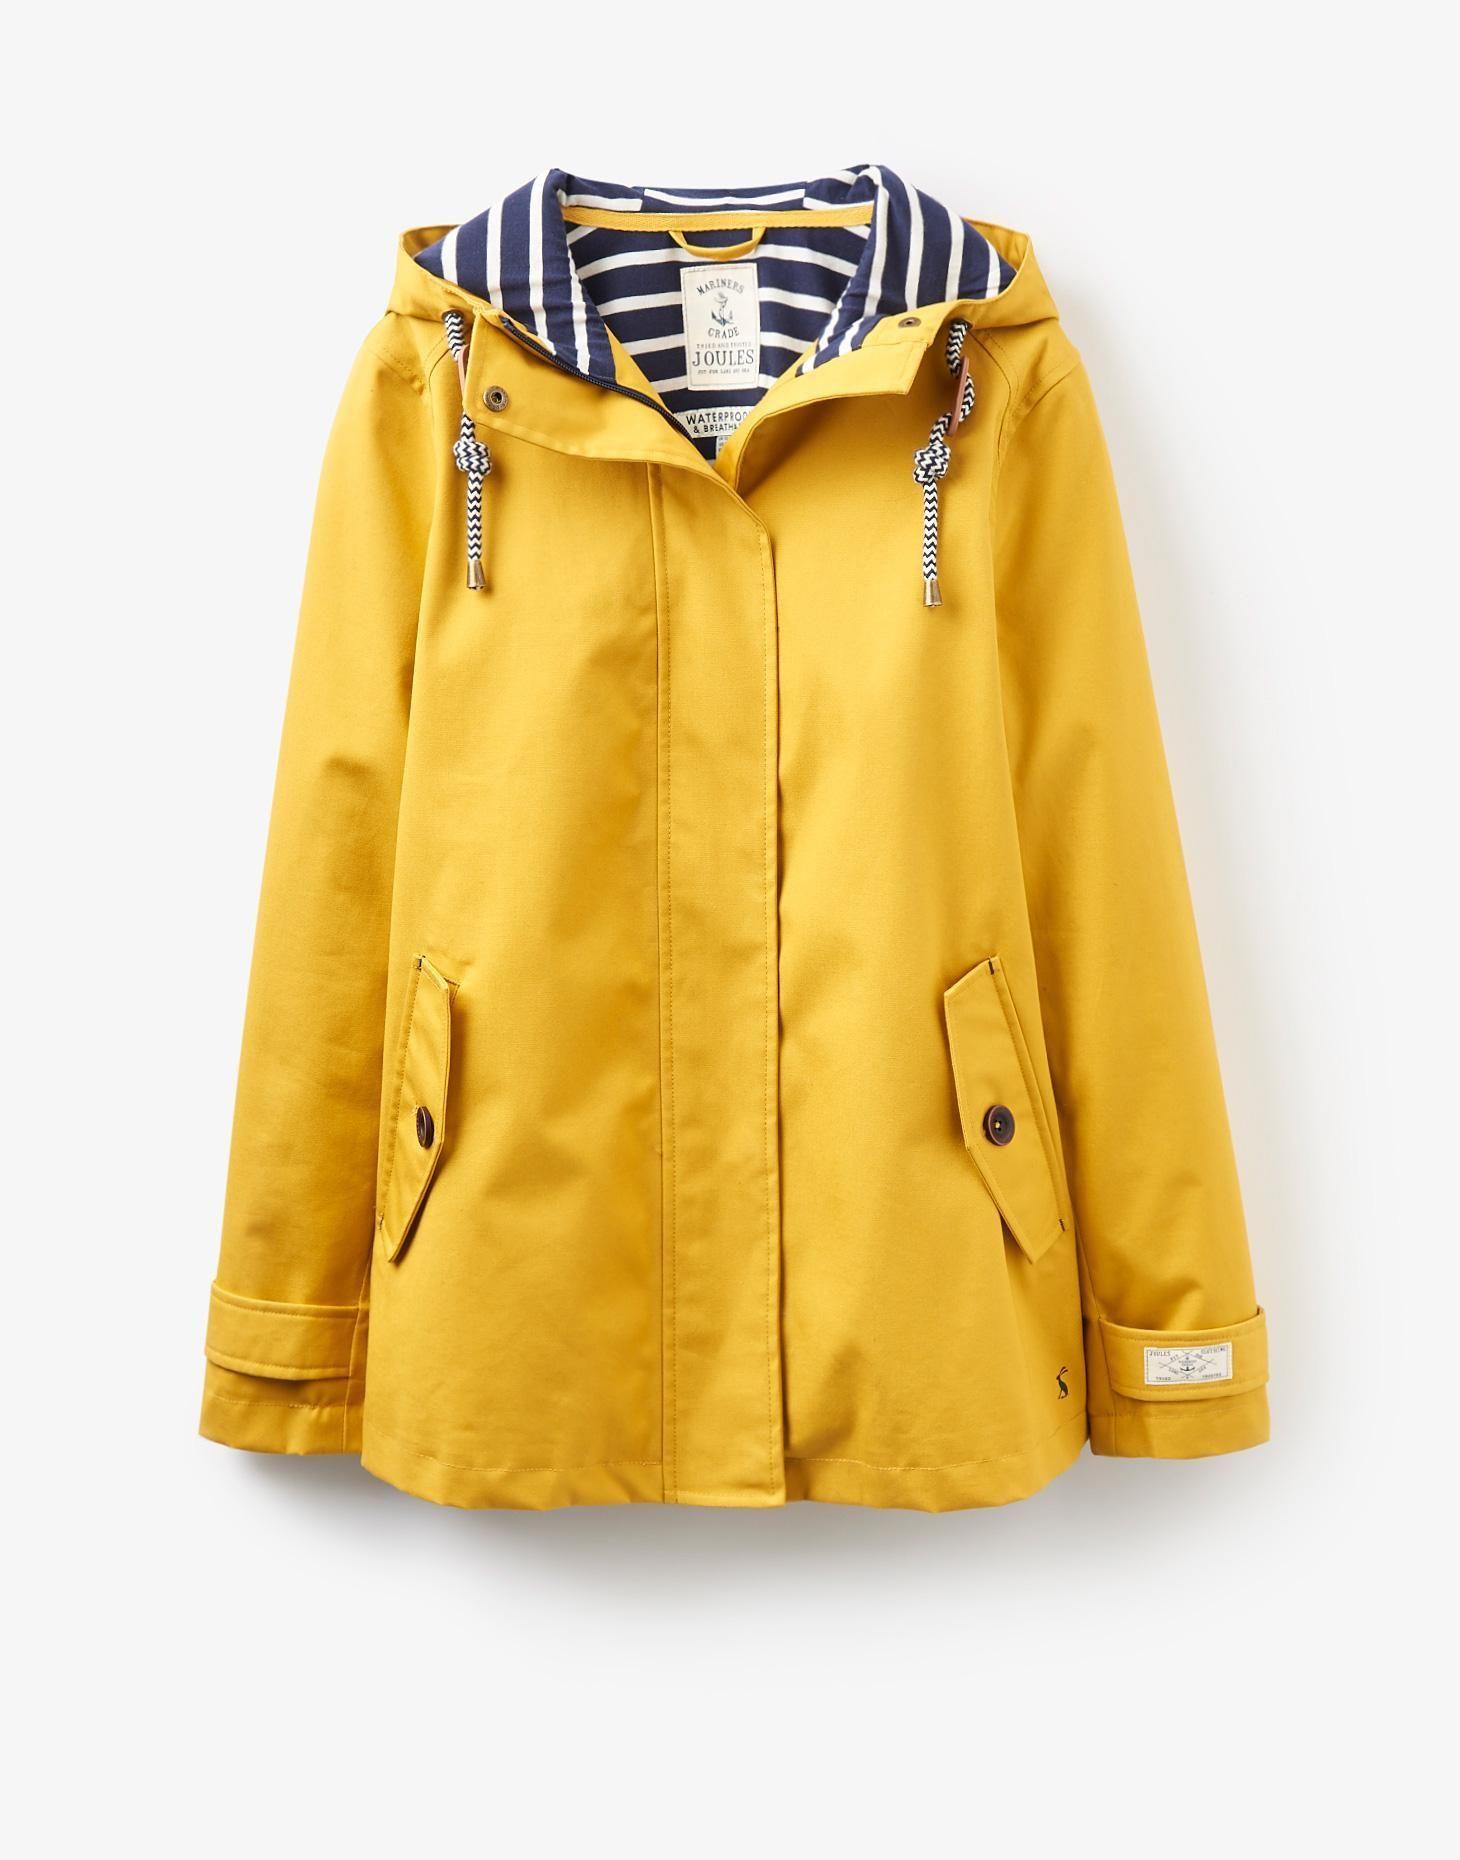 outlet online autumn shoes best shoes Coast Waterproof Jacket | Keep warm | Yellow rain jacket ...